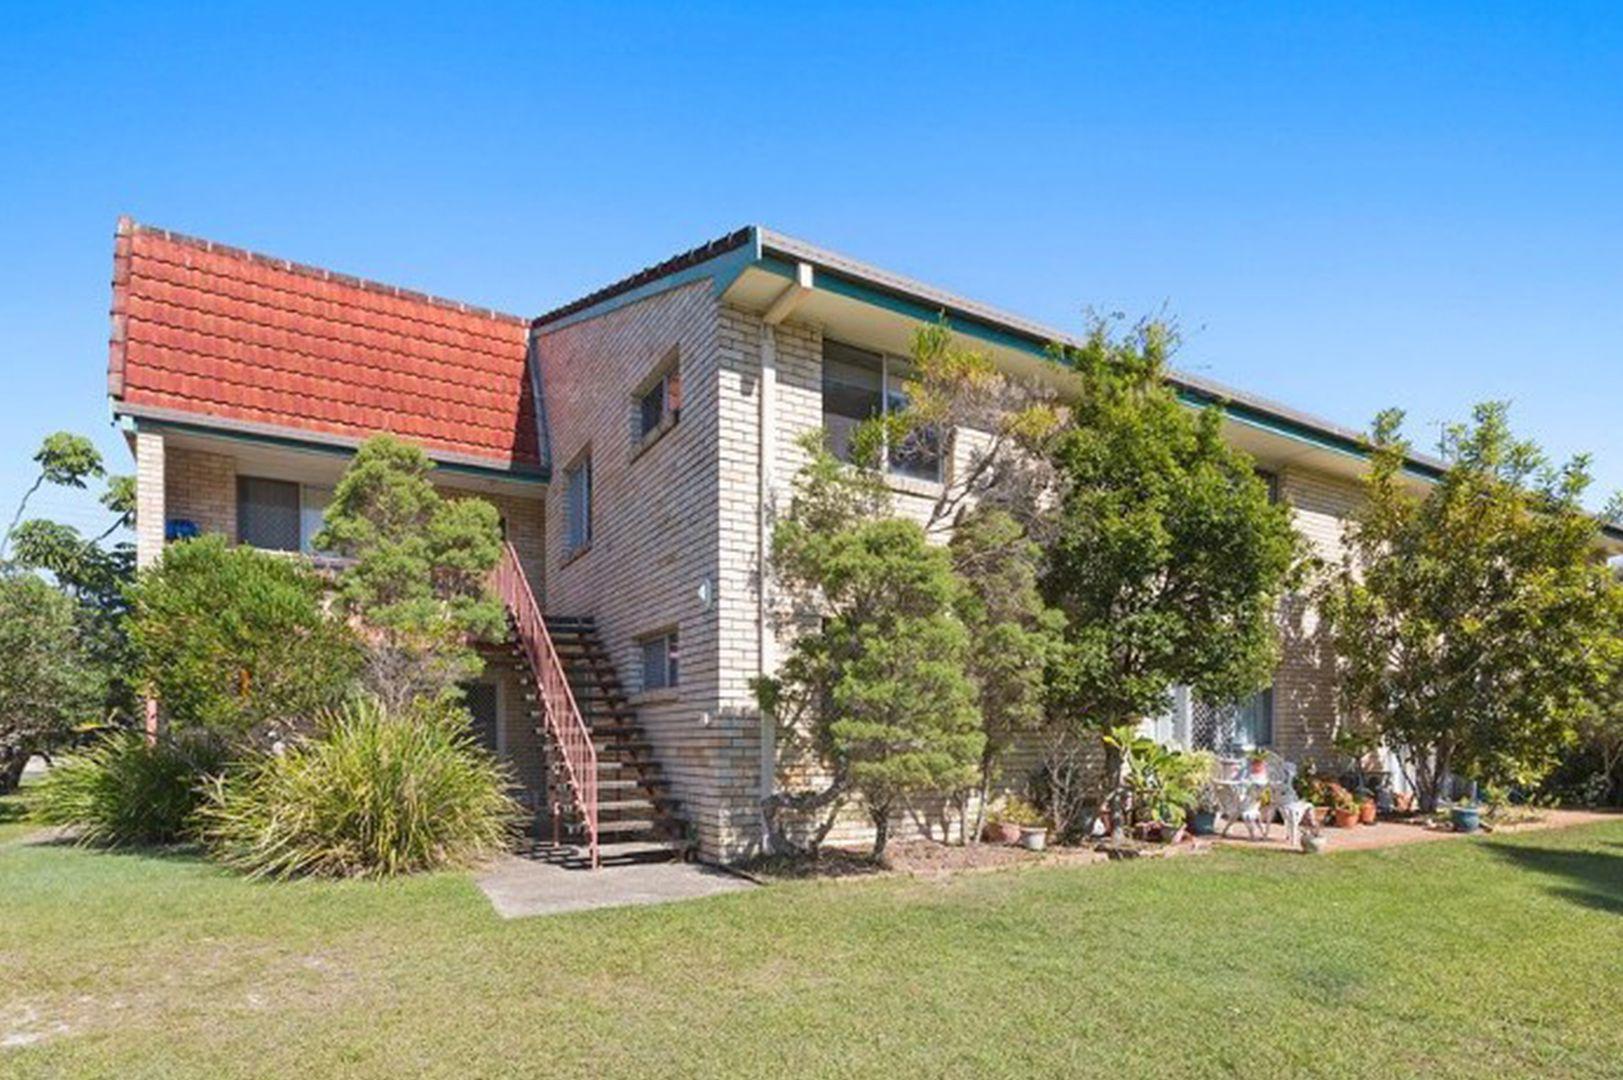 5/39 Coolangatta  Road, Coolangatta QLD 4225, Image 1